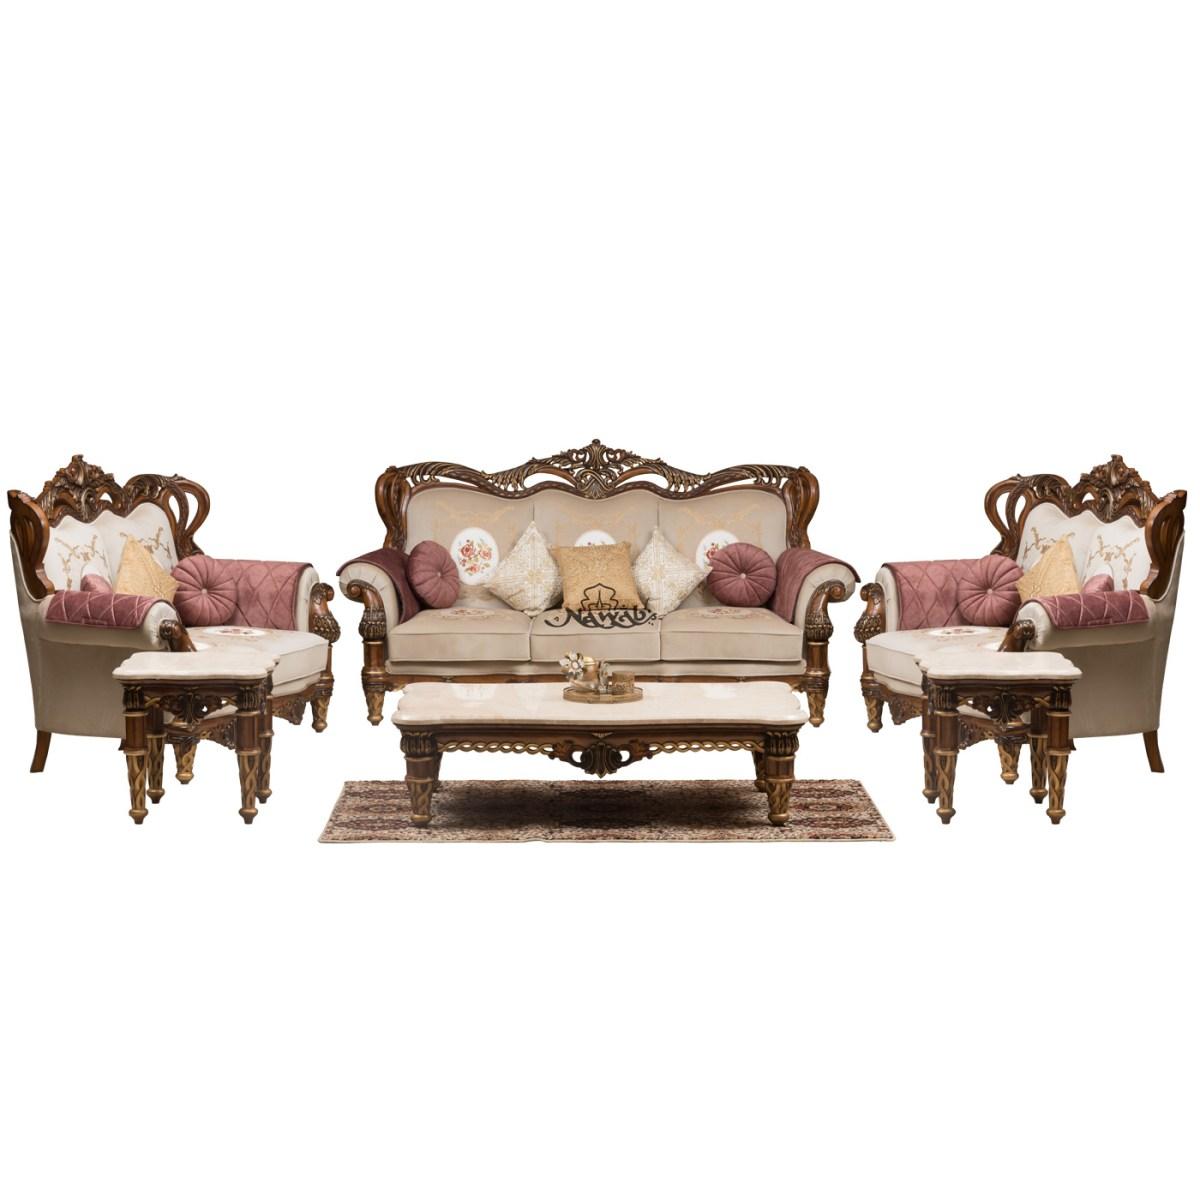 wallnut-mat-polish-solid-wooden-teak-with-carving-velvet-pattern-fabric